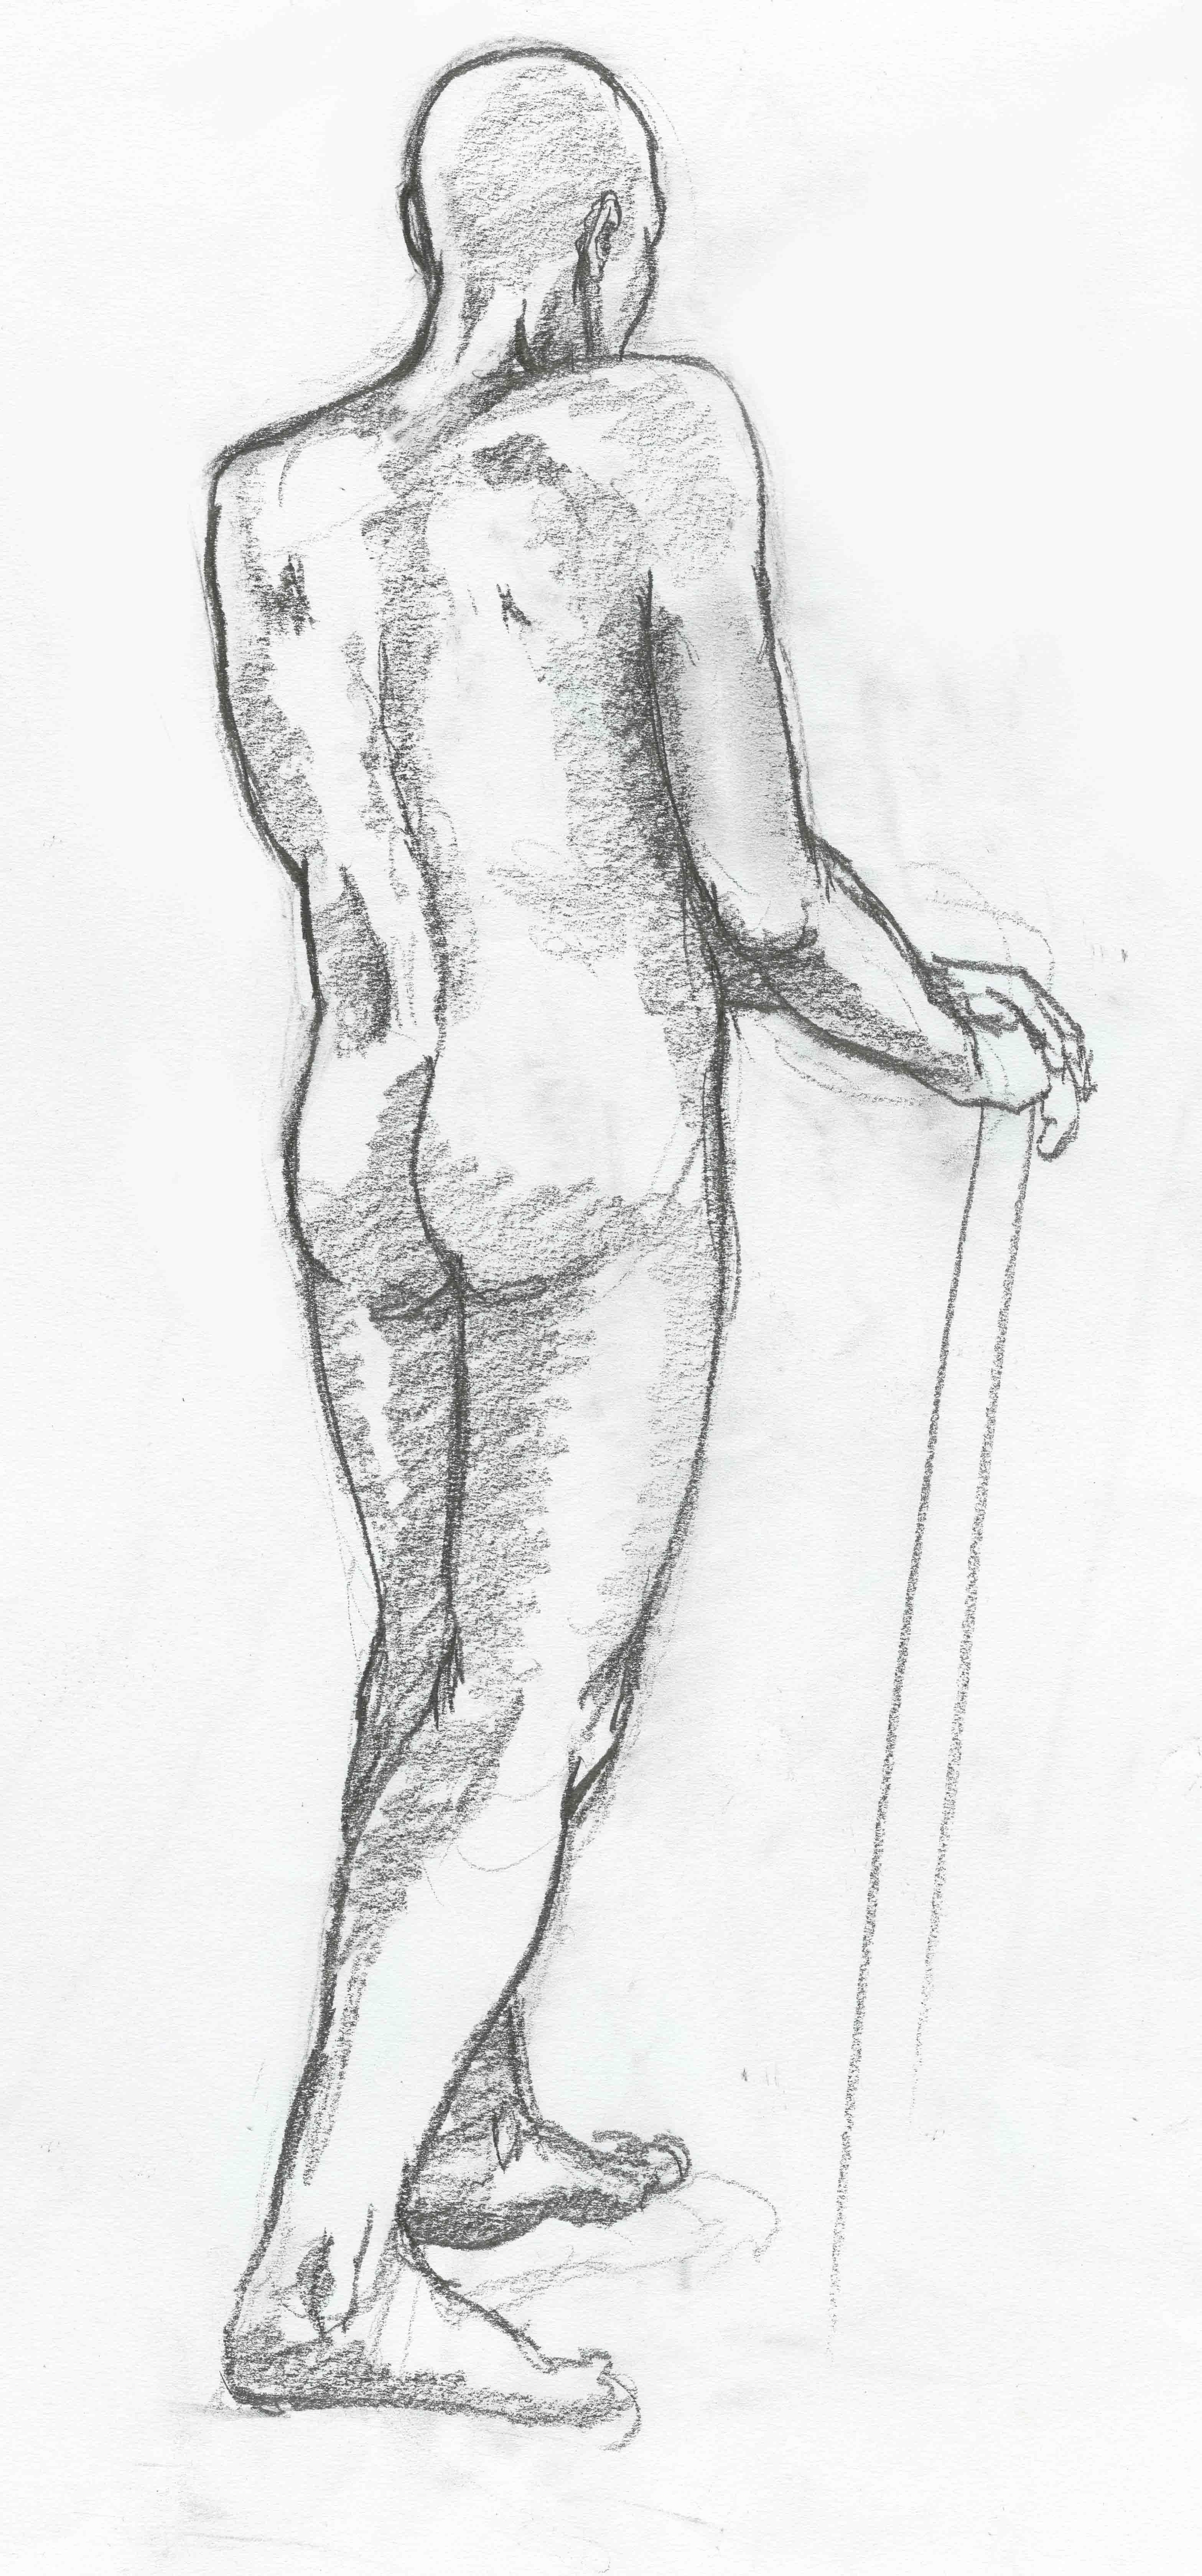 Noomis - Etudes, croquis & Wip [ Nudité ] - Page 6 160920112740704860